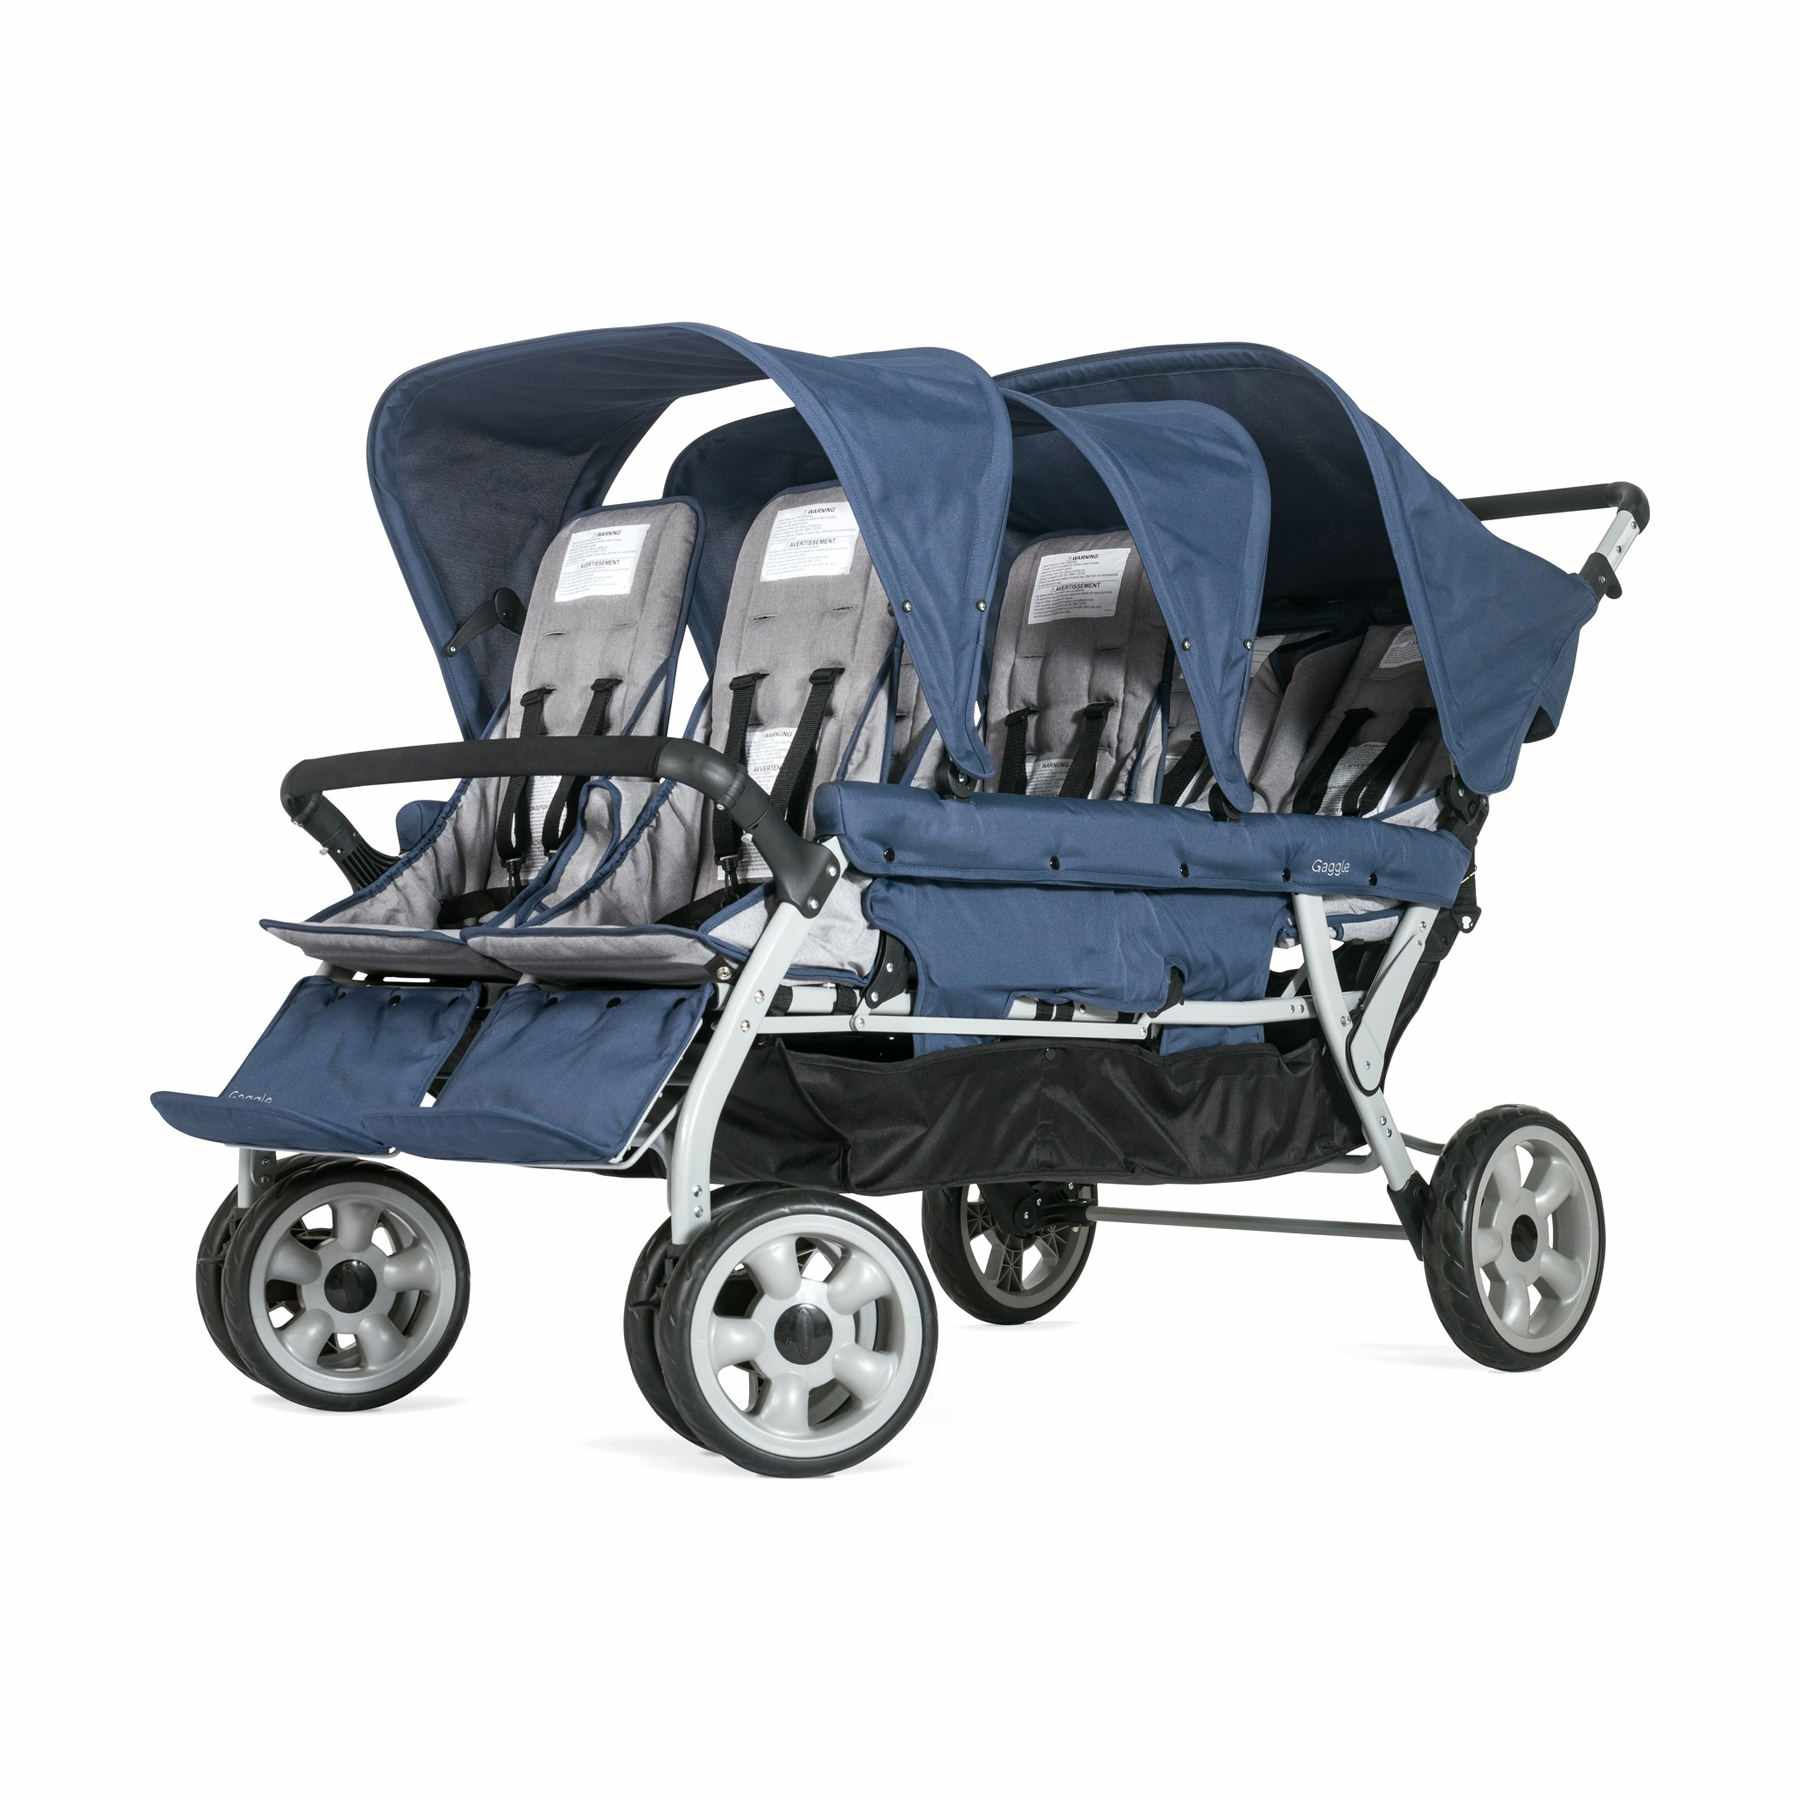 Foundations Gaggle Jamboree 6-Passenger Stroller